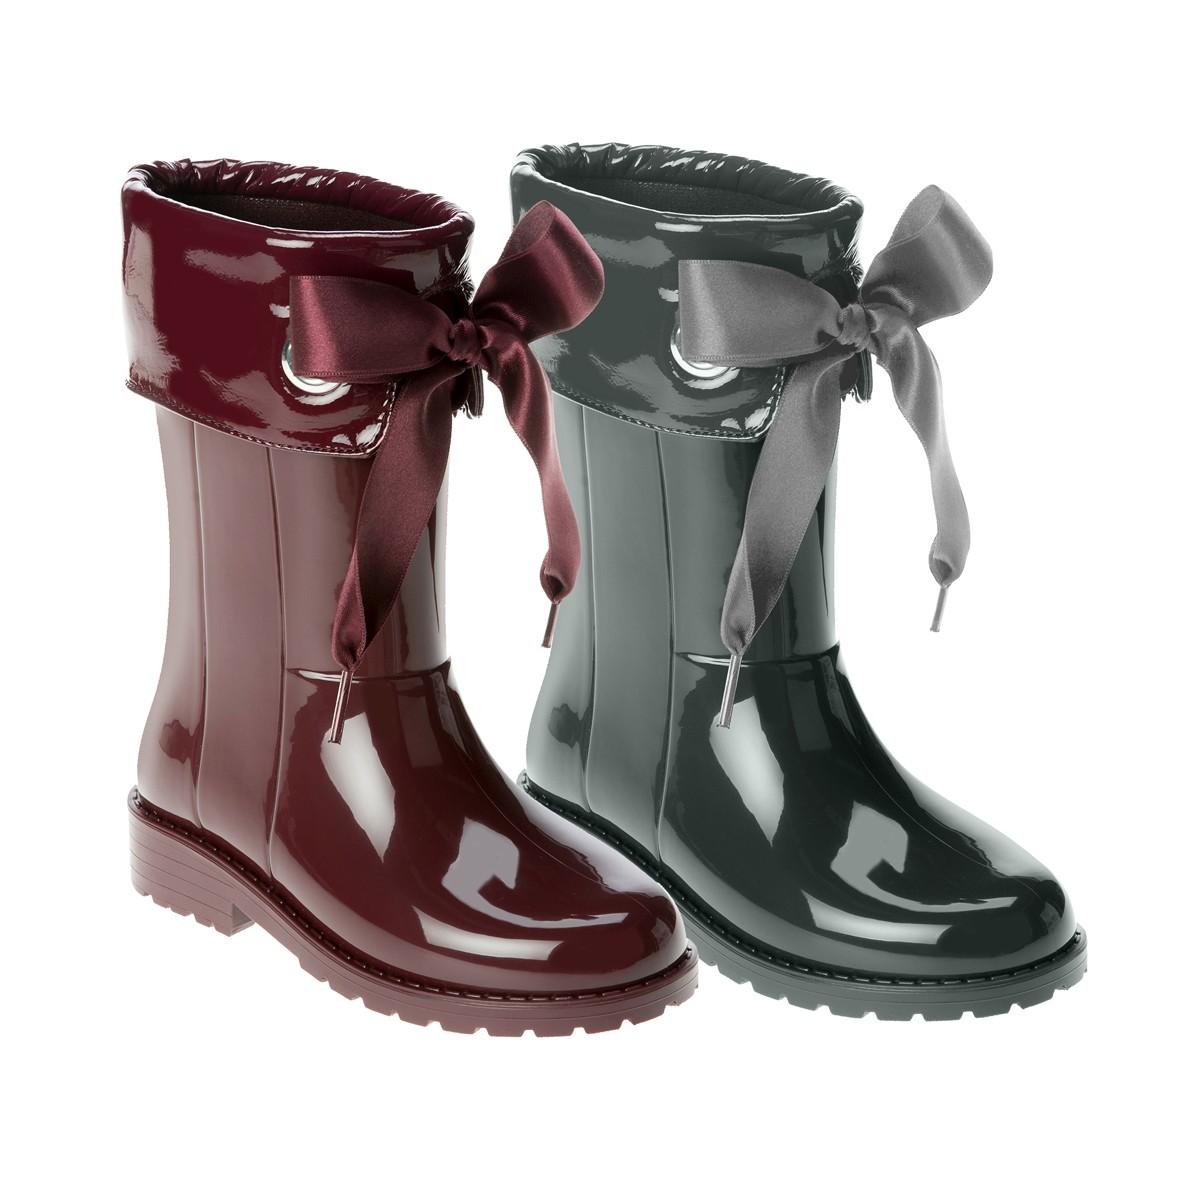 comprar botas para agua de niños